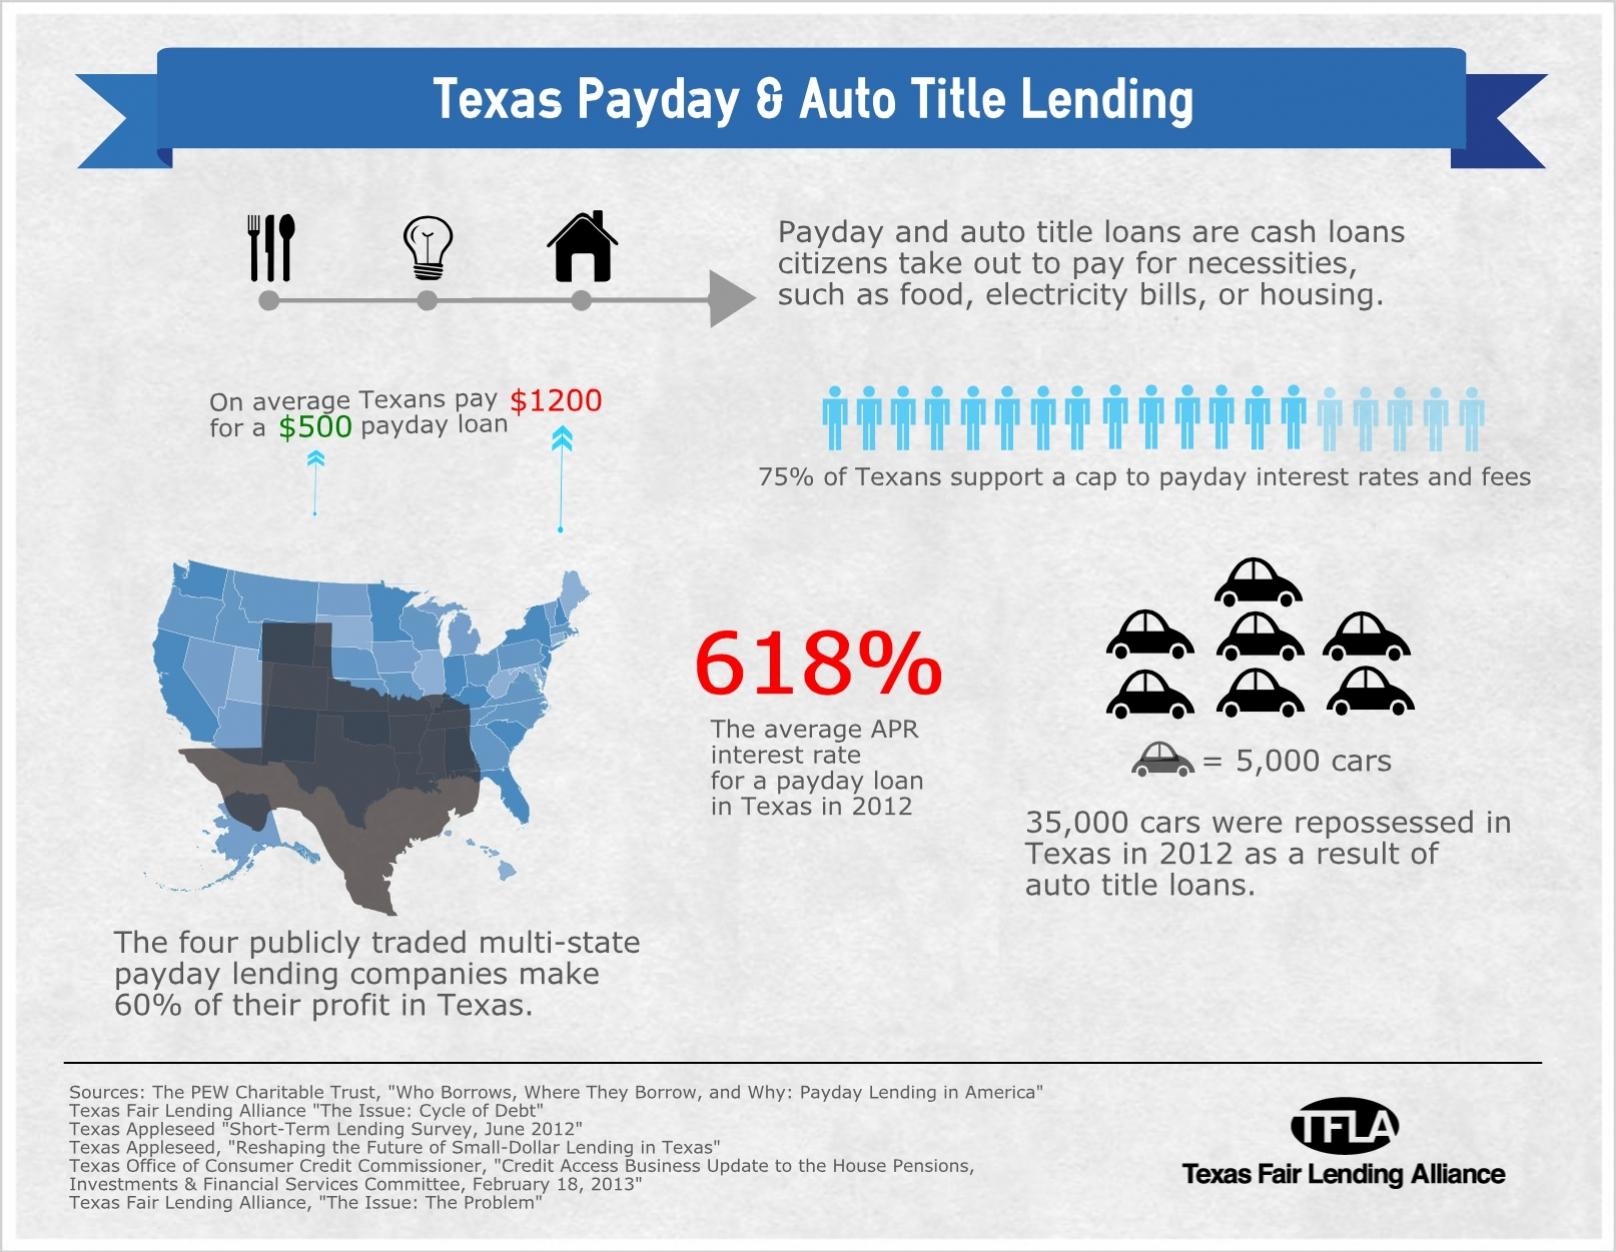 Loans For Fair Credit >> 122429txpaydayautotitlelendingimage Simple Infographic